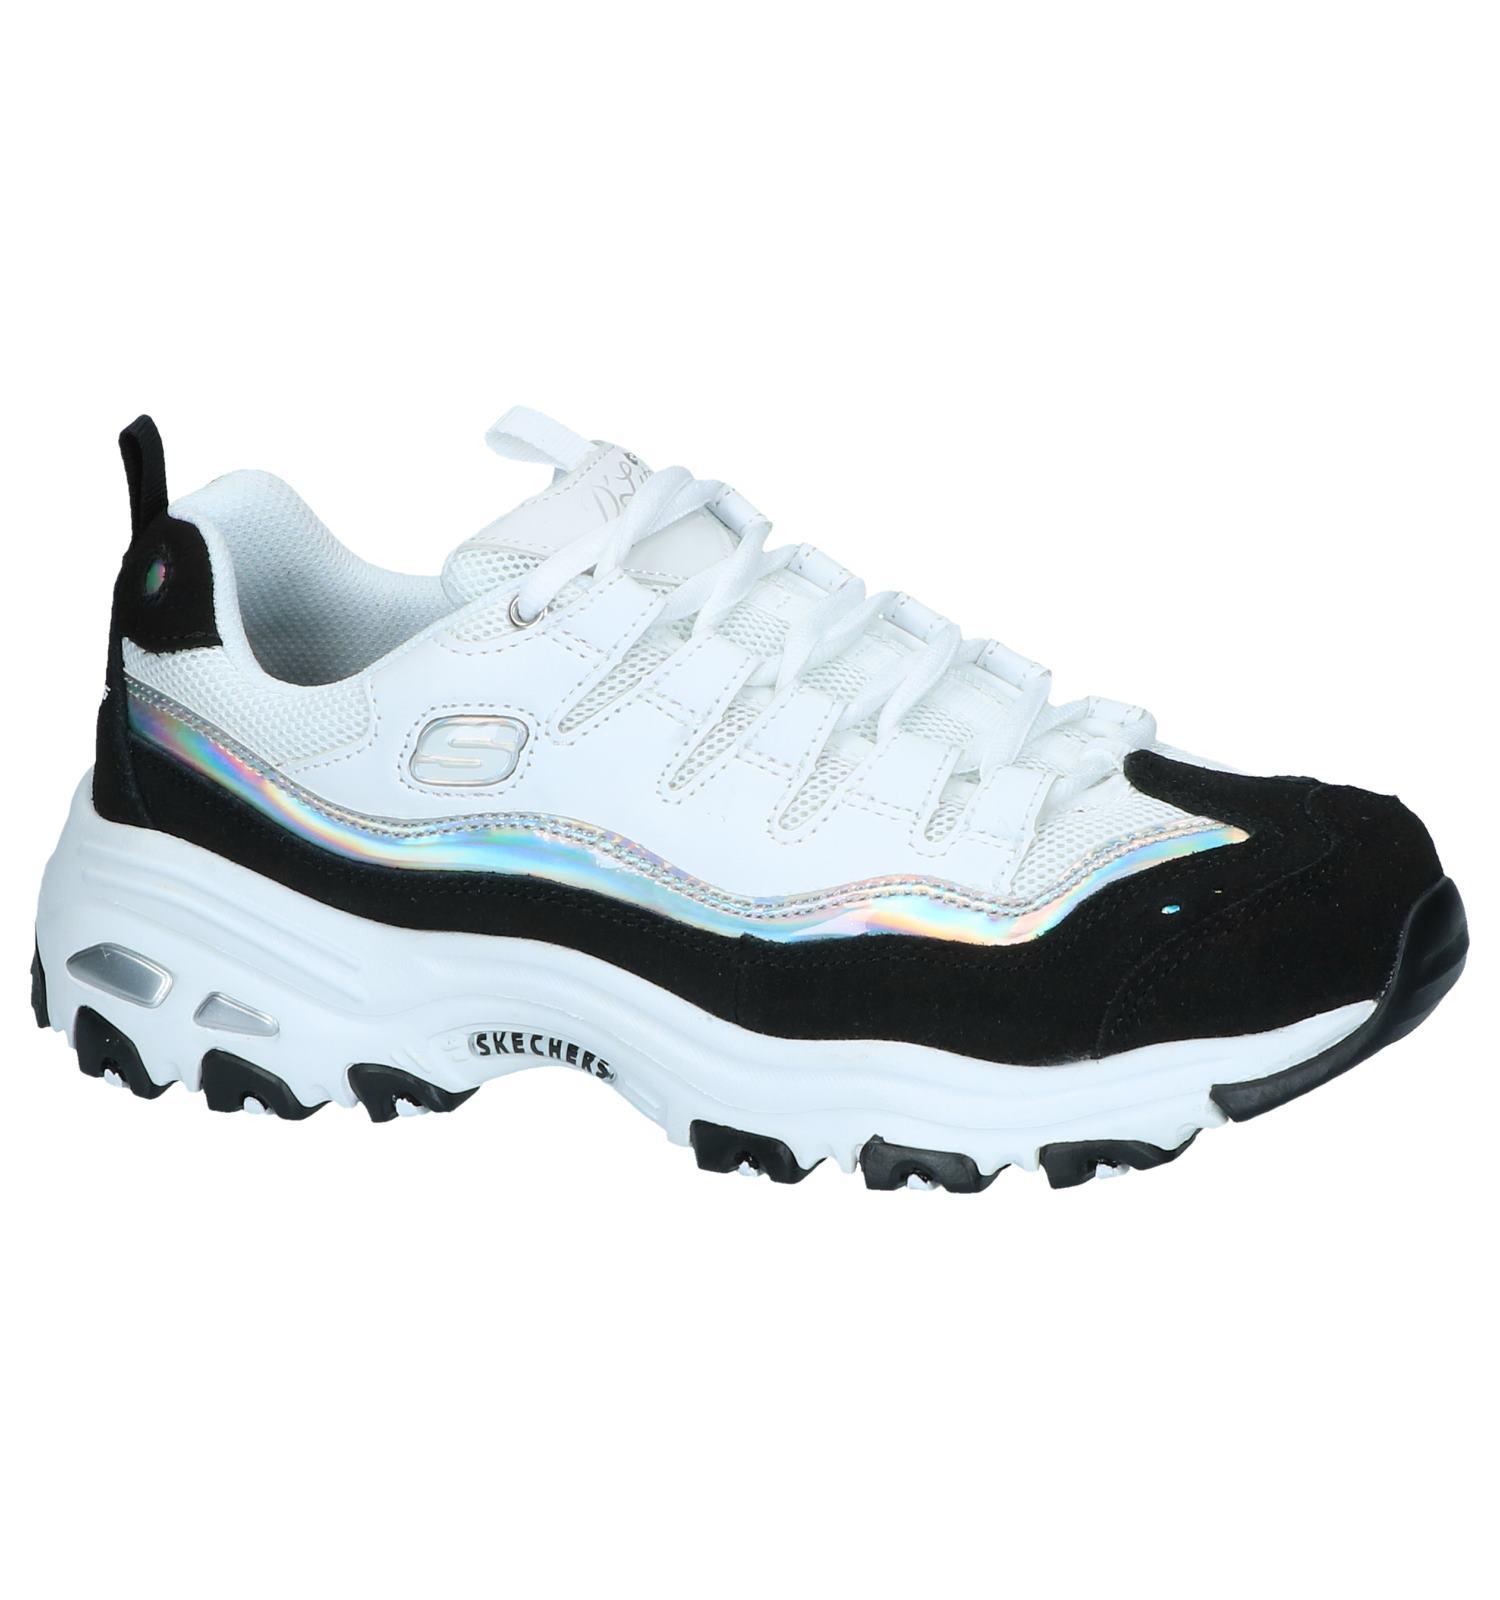 Witte Sneakers Skechers D'Lites Grand View | TORFS.BE | Gratis verzend en retour